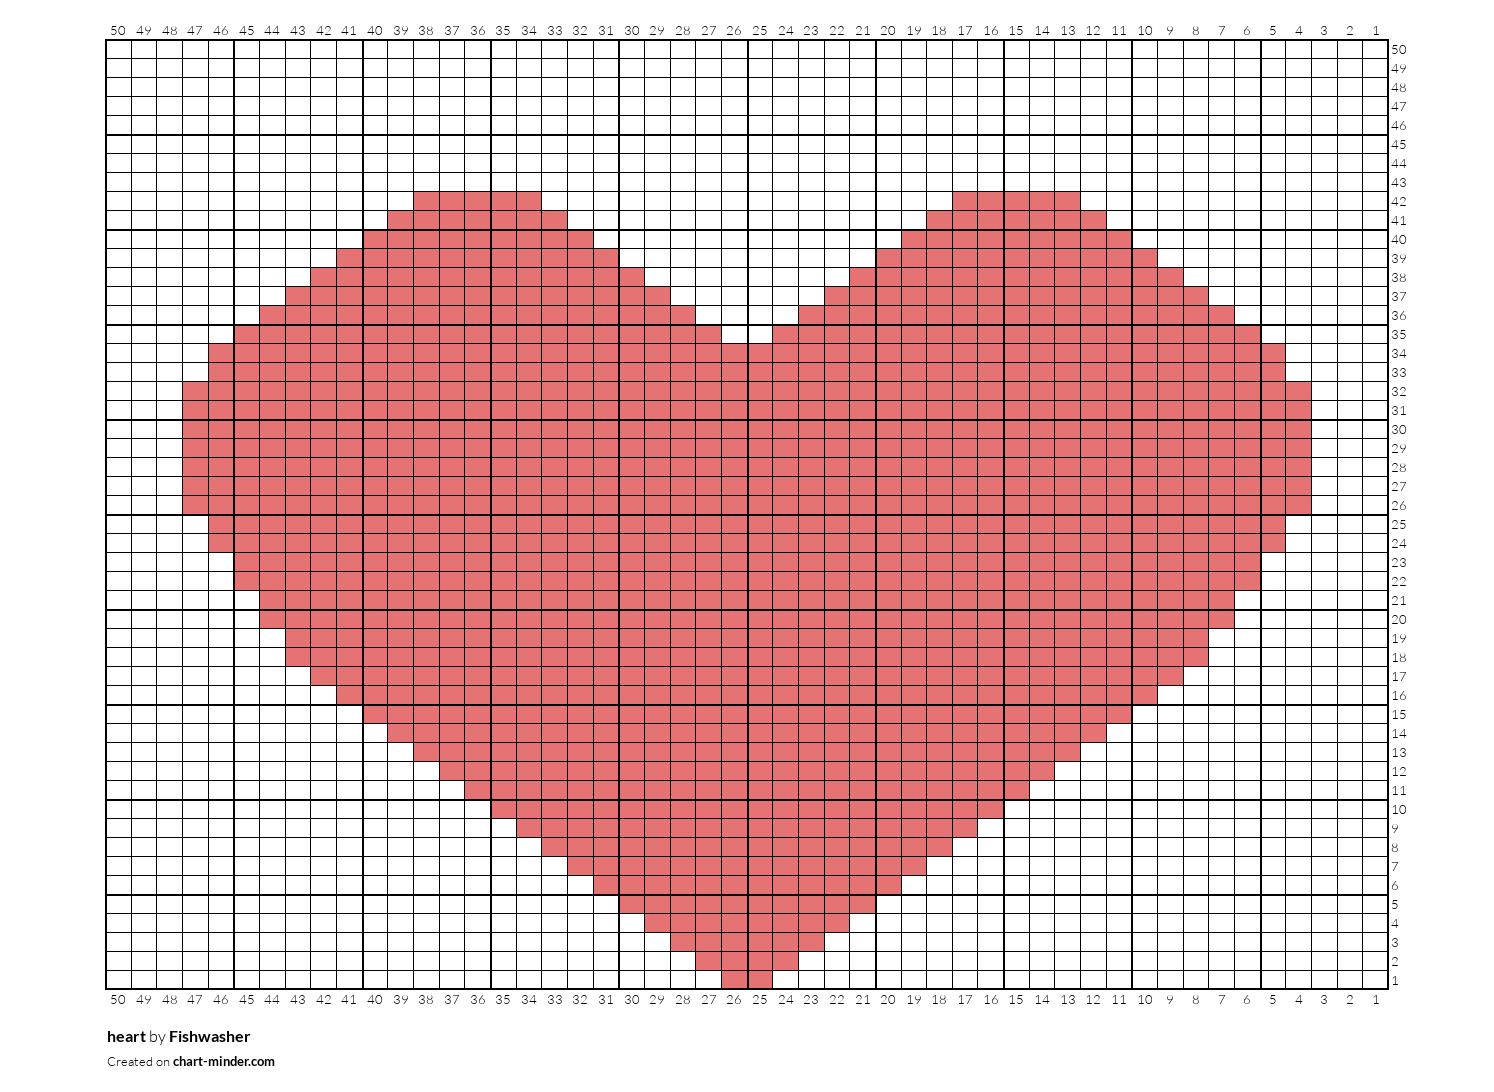 Copy of heart